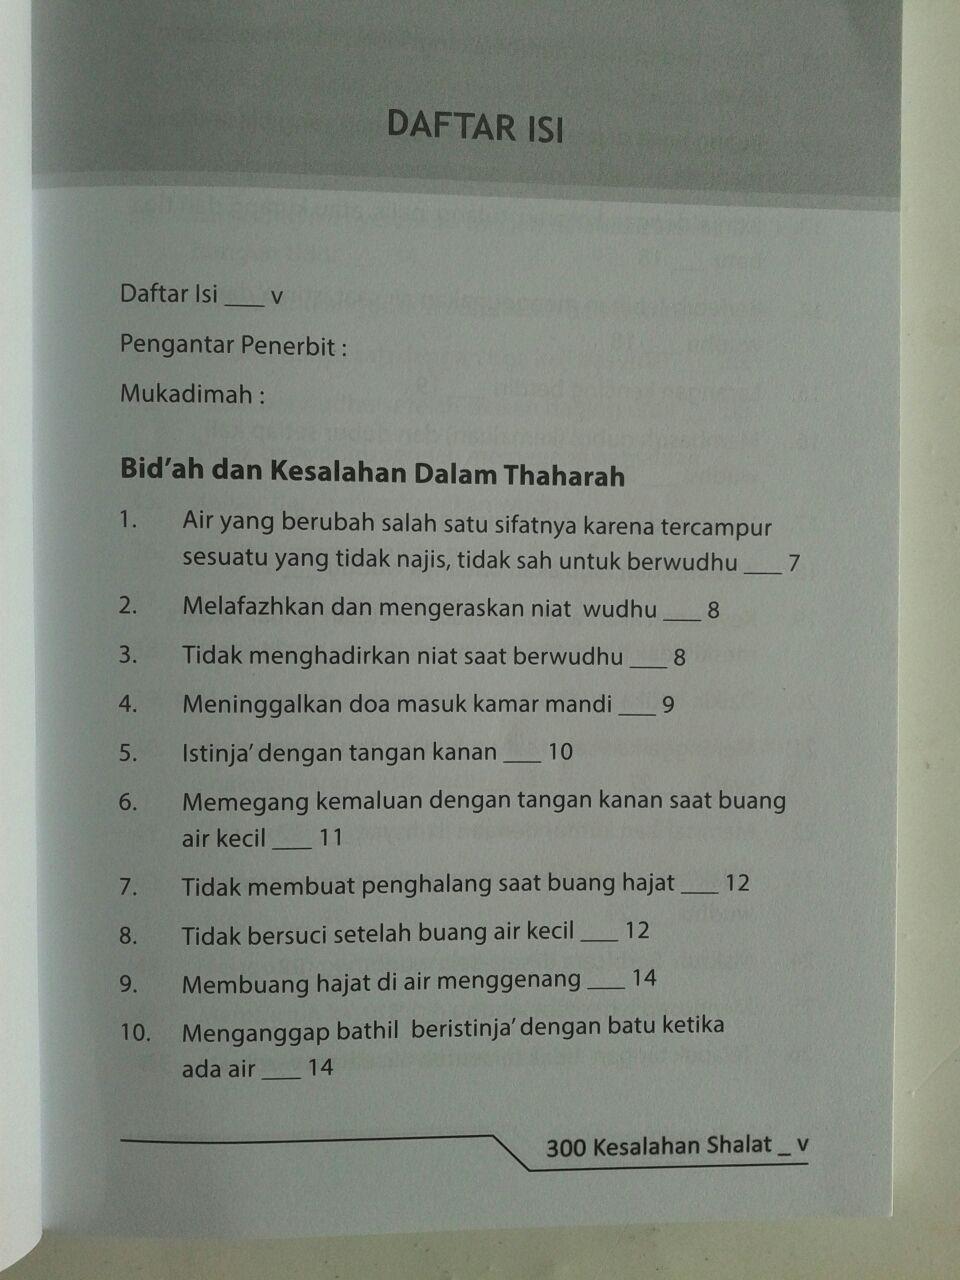 Buku 300 Kesalahan Shalat Yang Sering Diremehkan isi 2